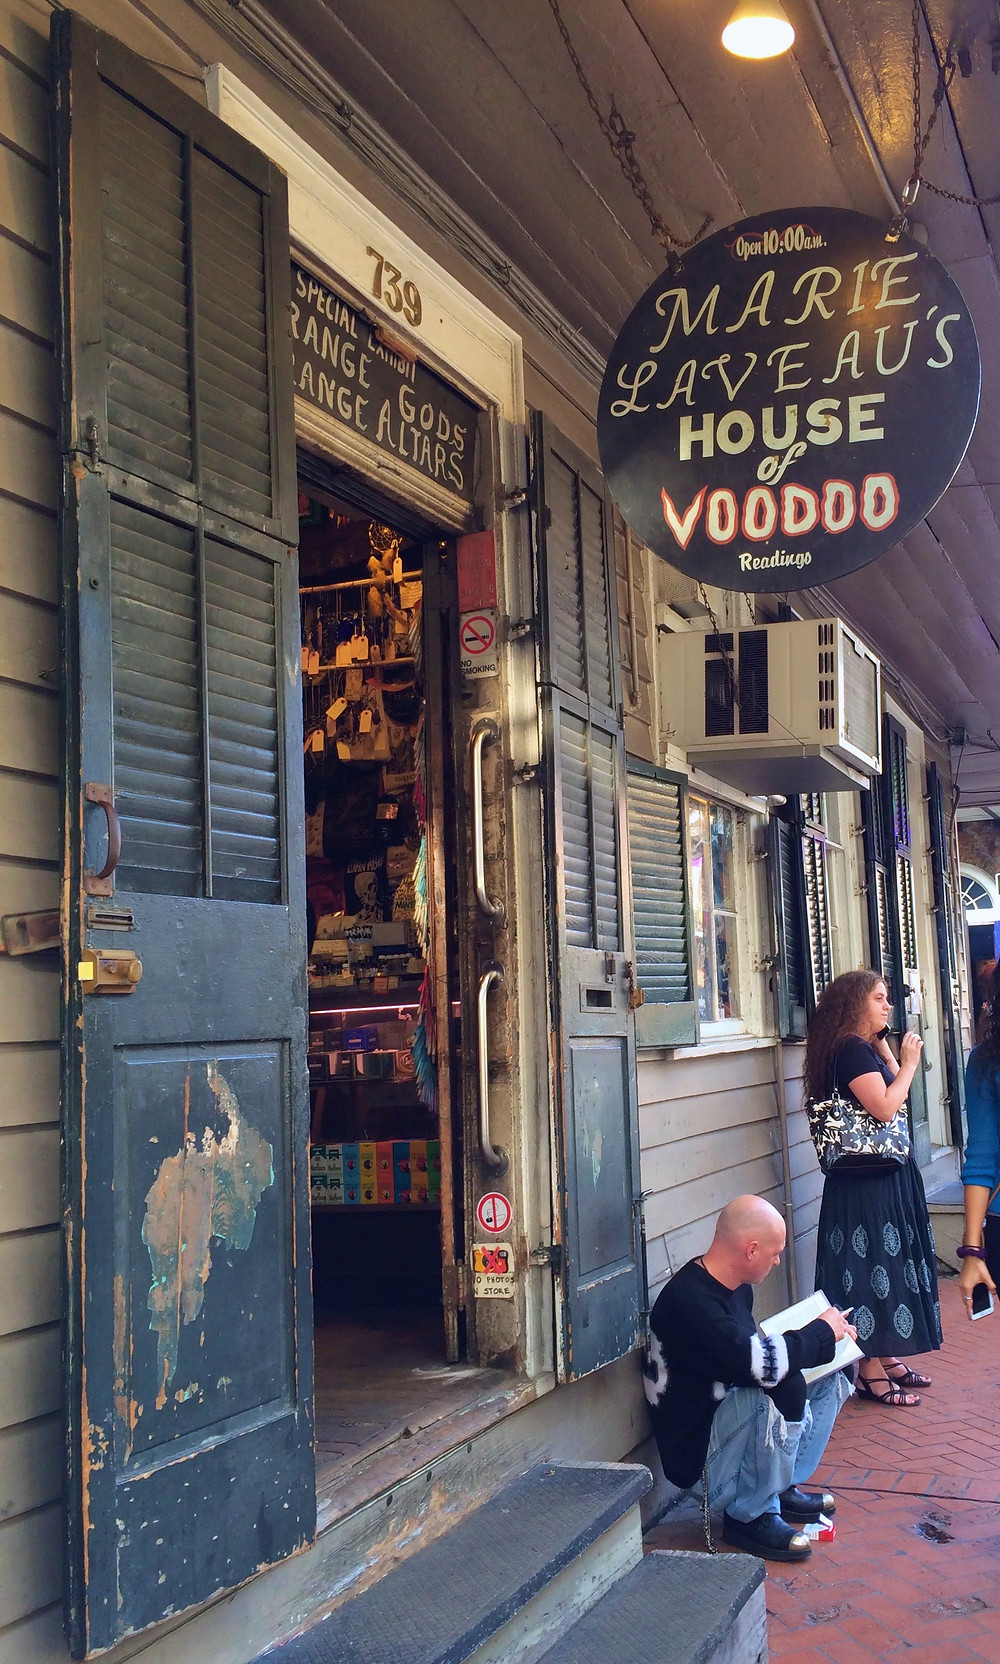 Marie Laveau's House of Voodoo I Voodoo Shop I New Orleans Travel Guide I Nicole Riccardo